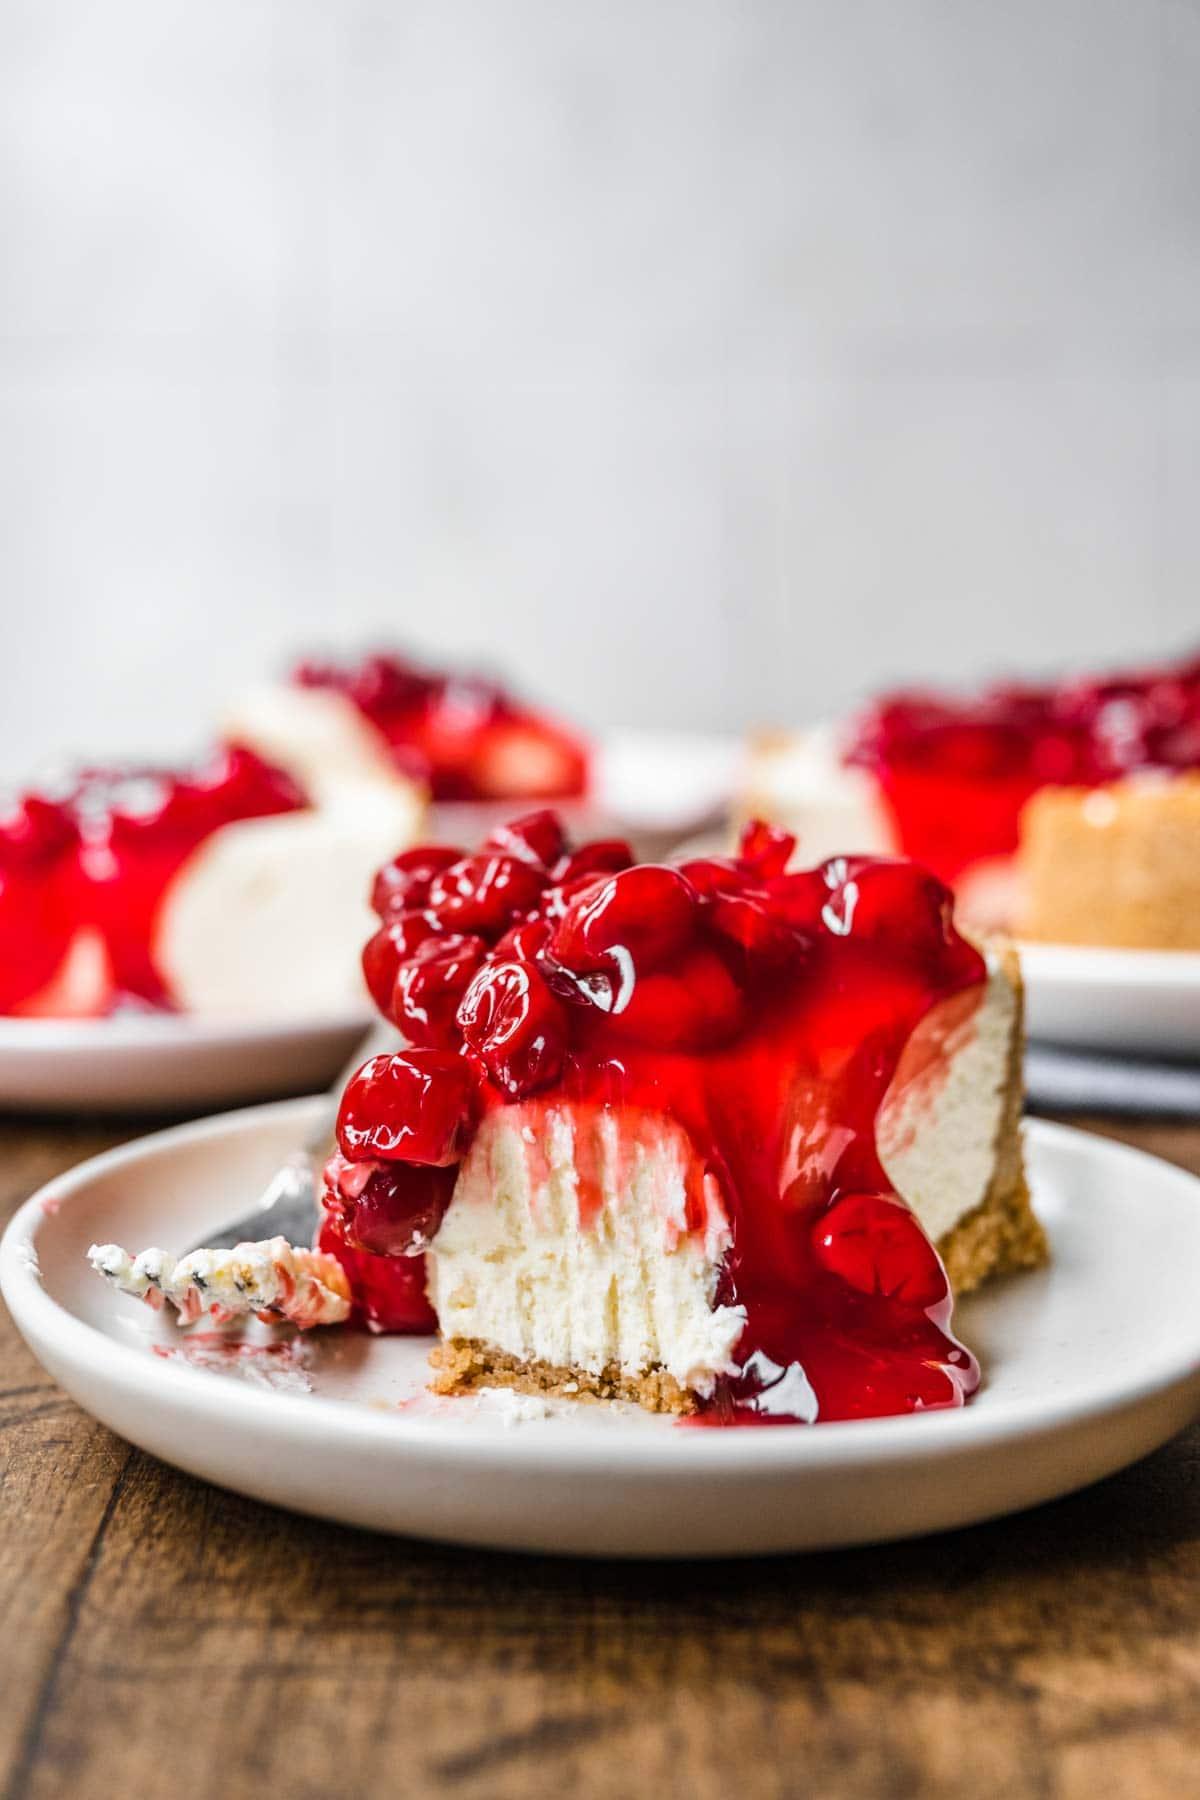 No Bake Cherry Cheesecake slice on plate